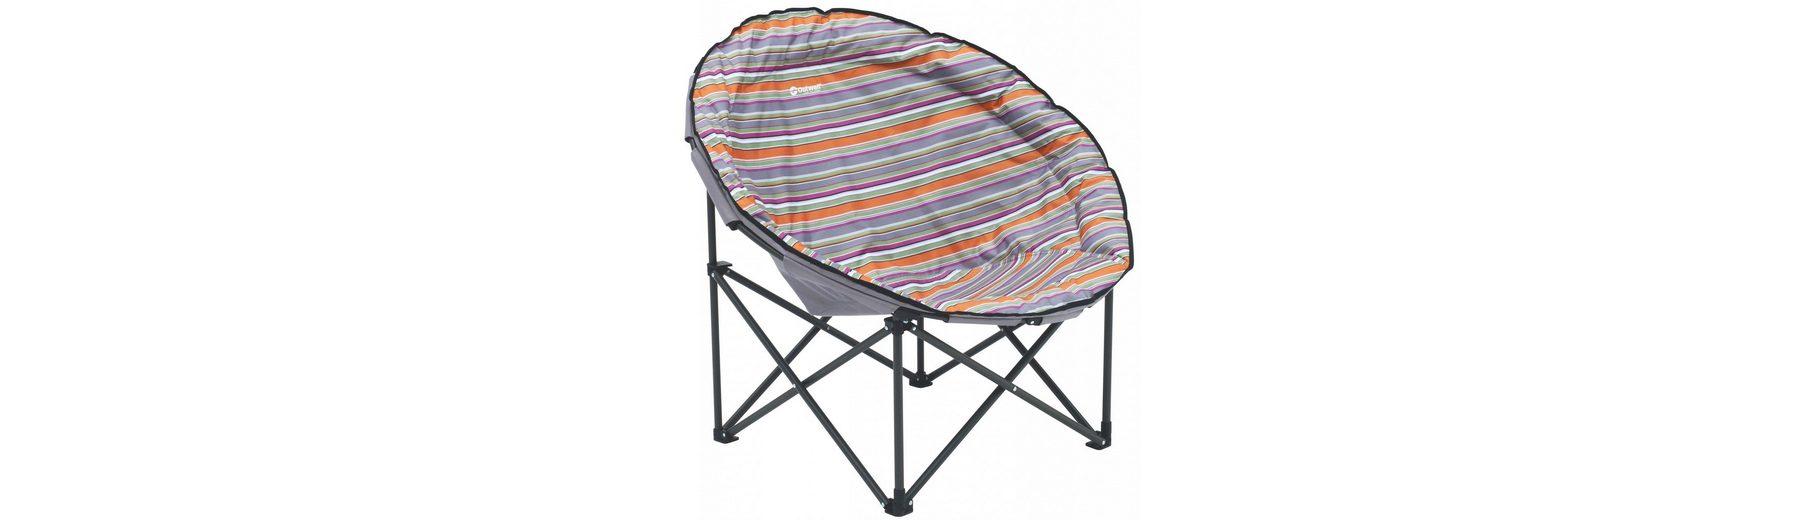 Outwell Camping-Stuhl »Trelew XL Summer Folding Chair«